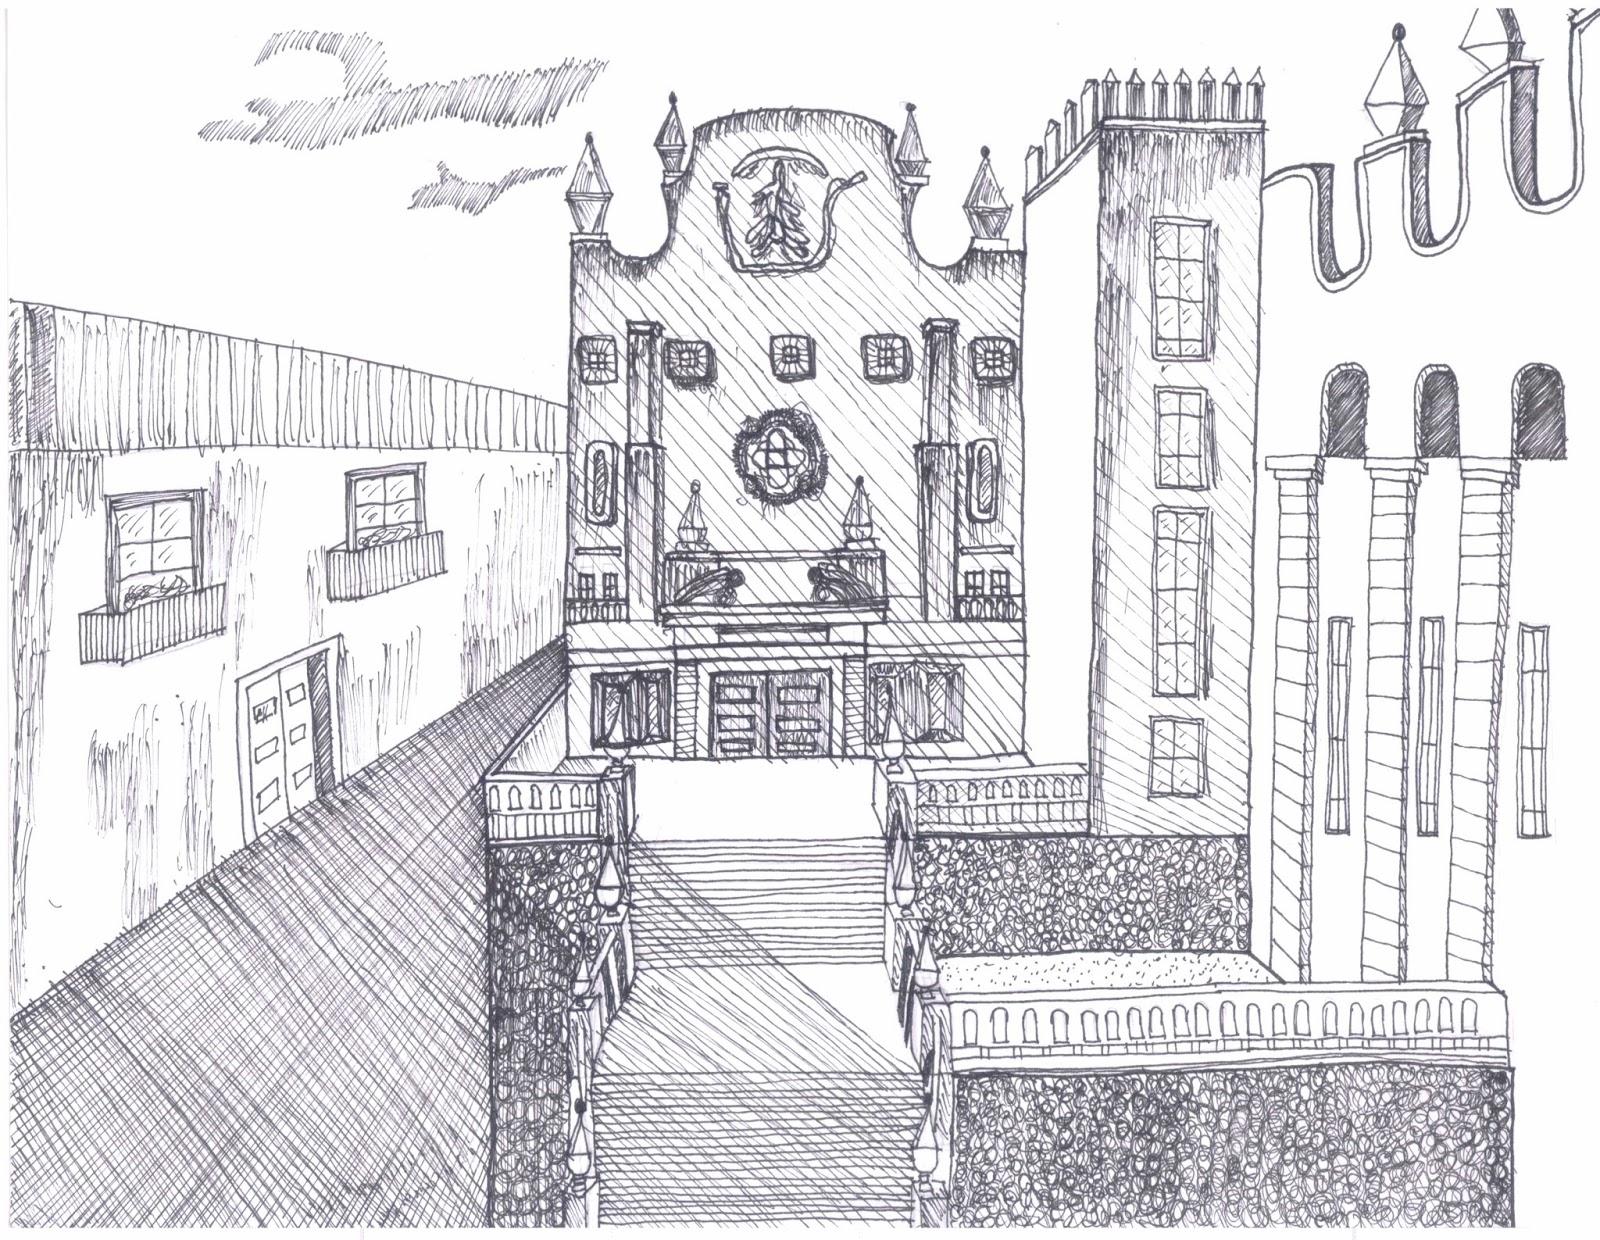 Arquitectura mexicana universidad de guanajuato for Universidades que ofrecen arquitectura